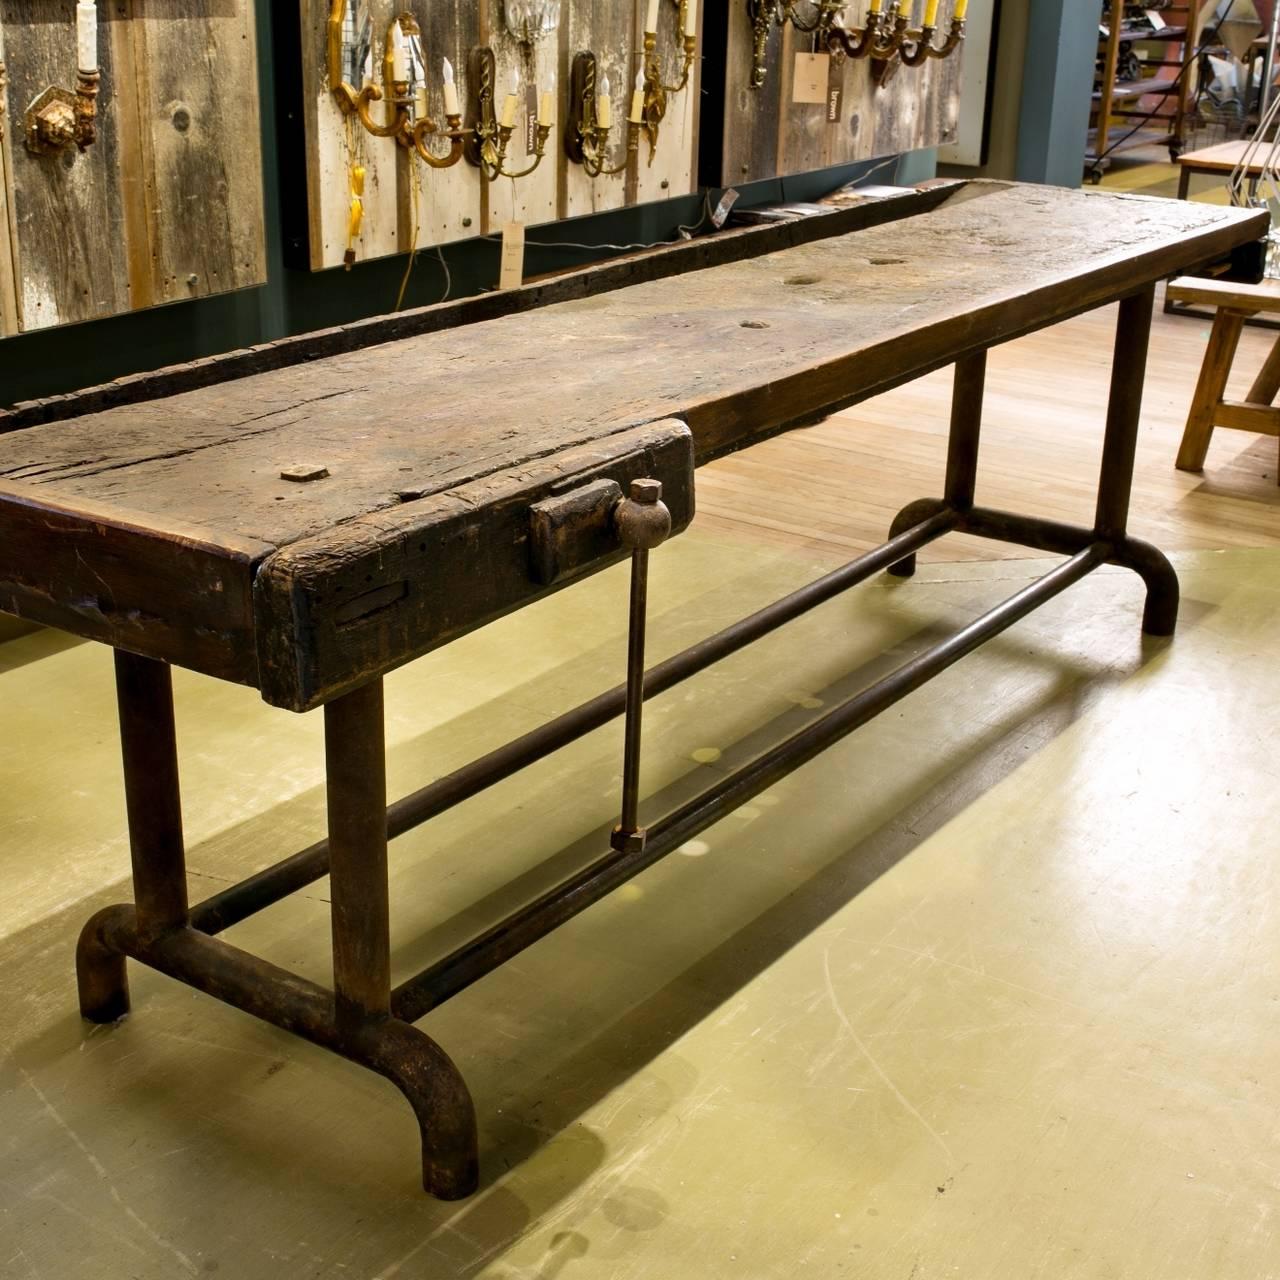 Refurbished Dutch Antique Industrial Work Table, circa 1900 5